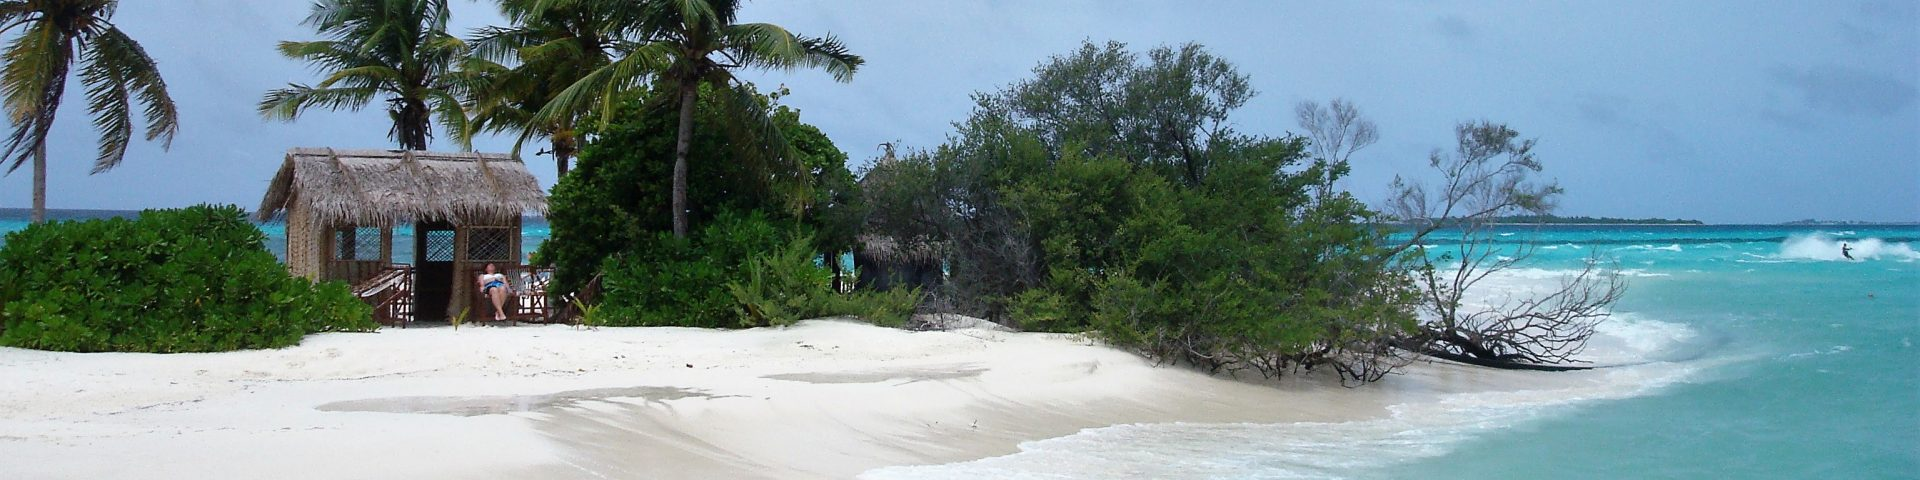 Maldives Insula Kuredu